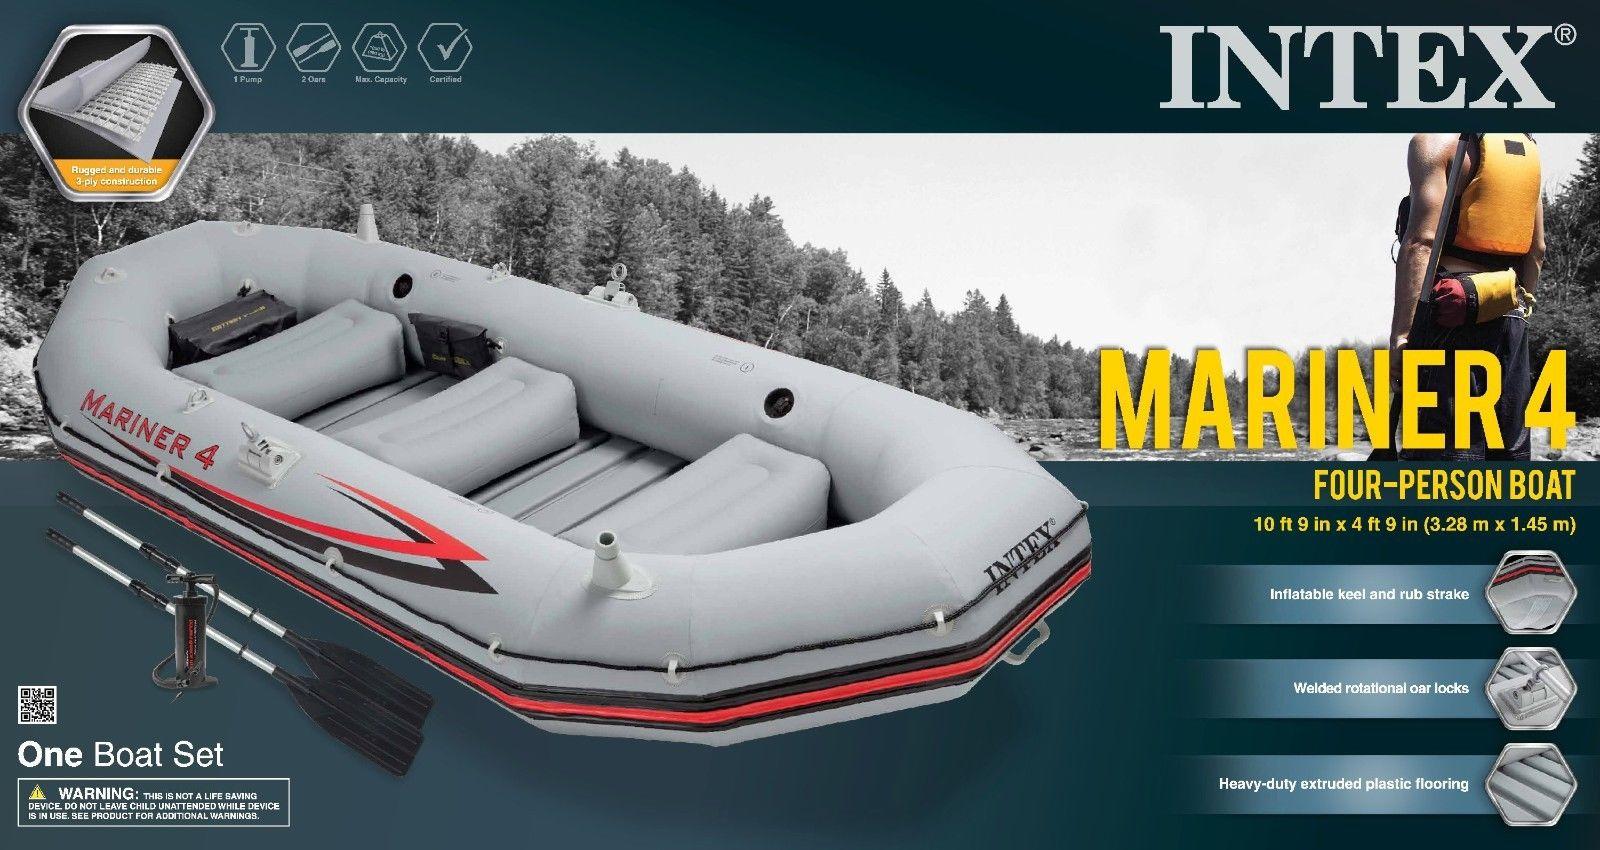 Intex Mariner 4 Inflatable Raft River Lake Dinghy Boat  Oars Set 68376EP New 520201008860  eBay